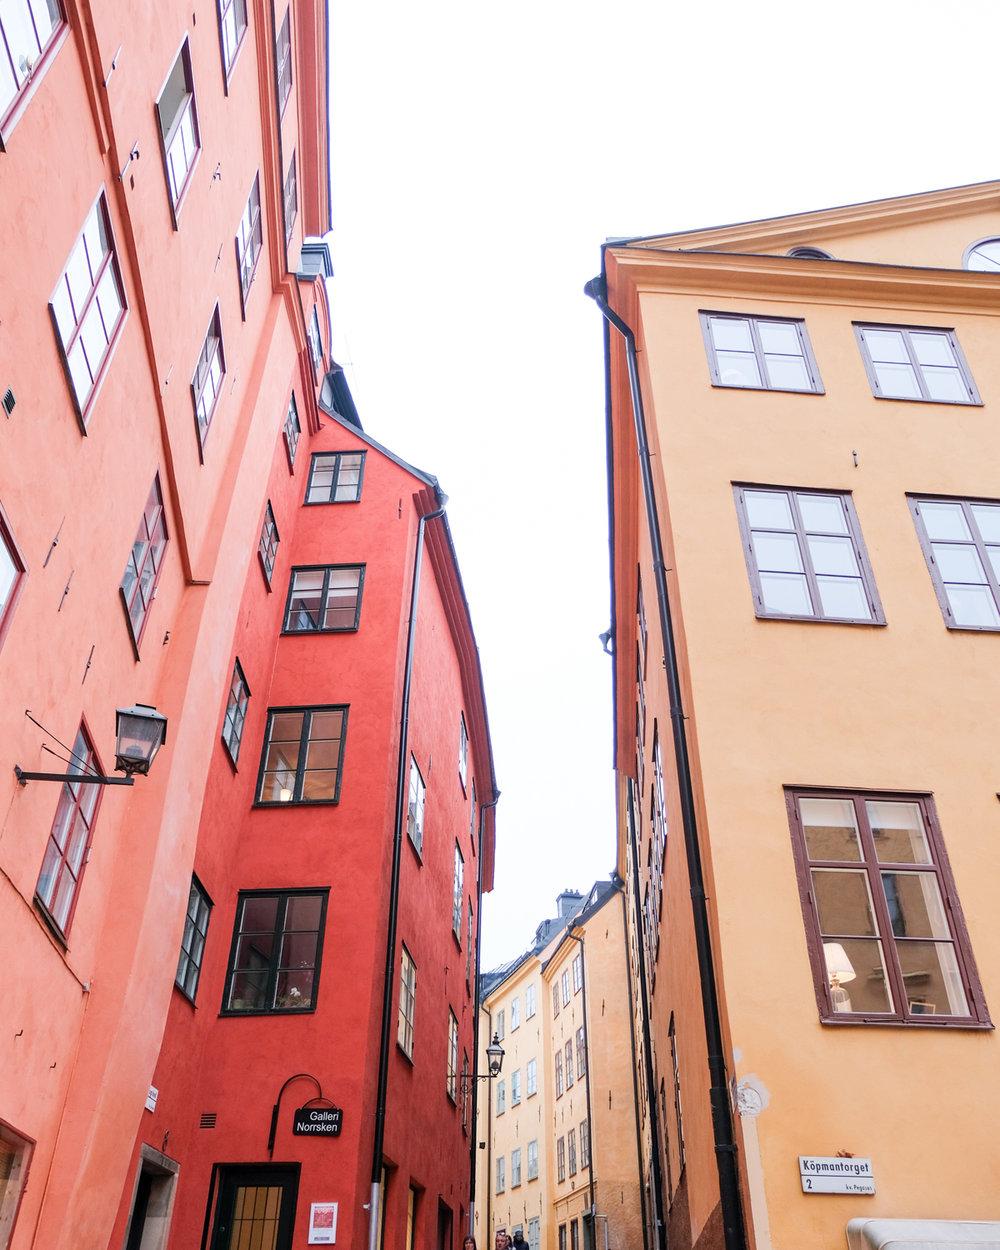 stockholm5_lishcreative.jpg